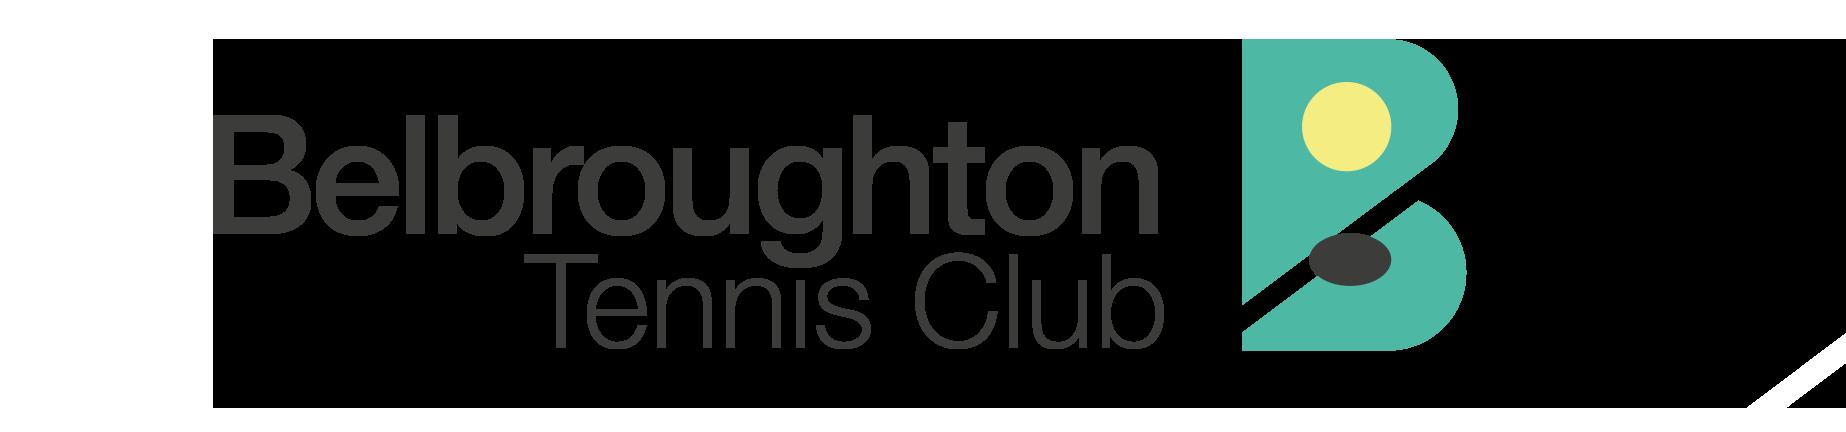 Belbroughton Tennis Club